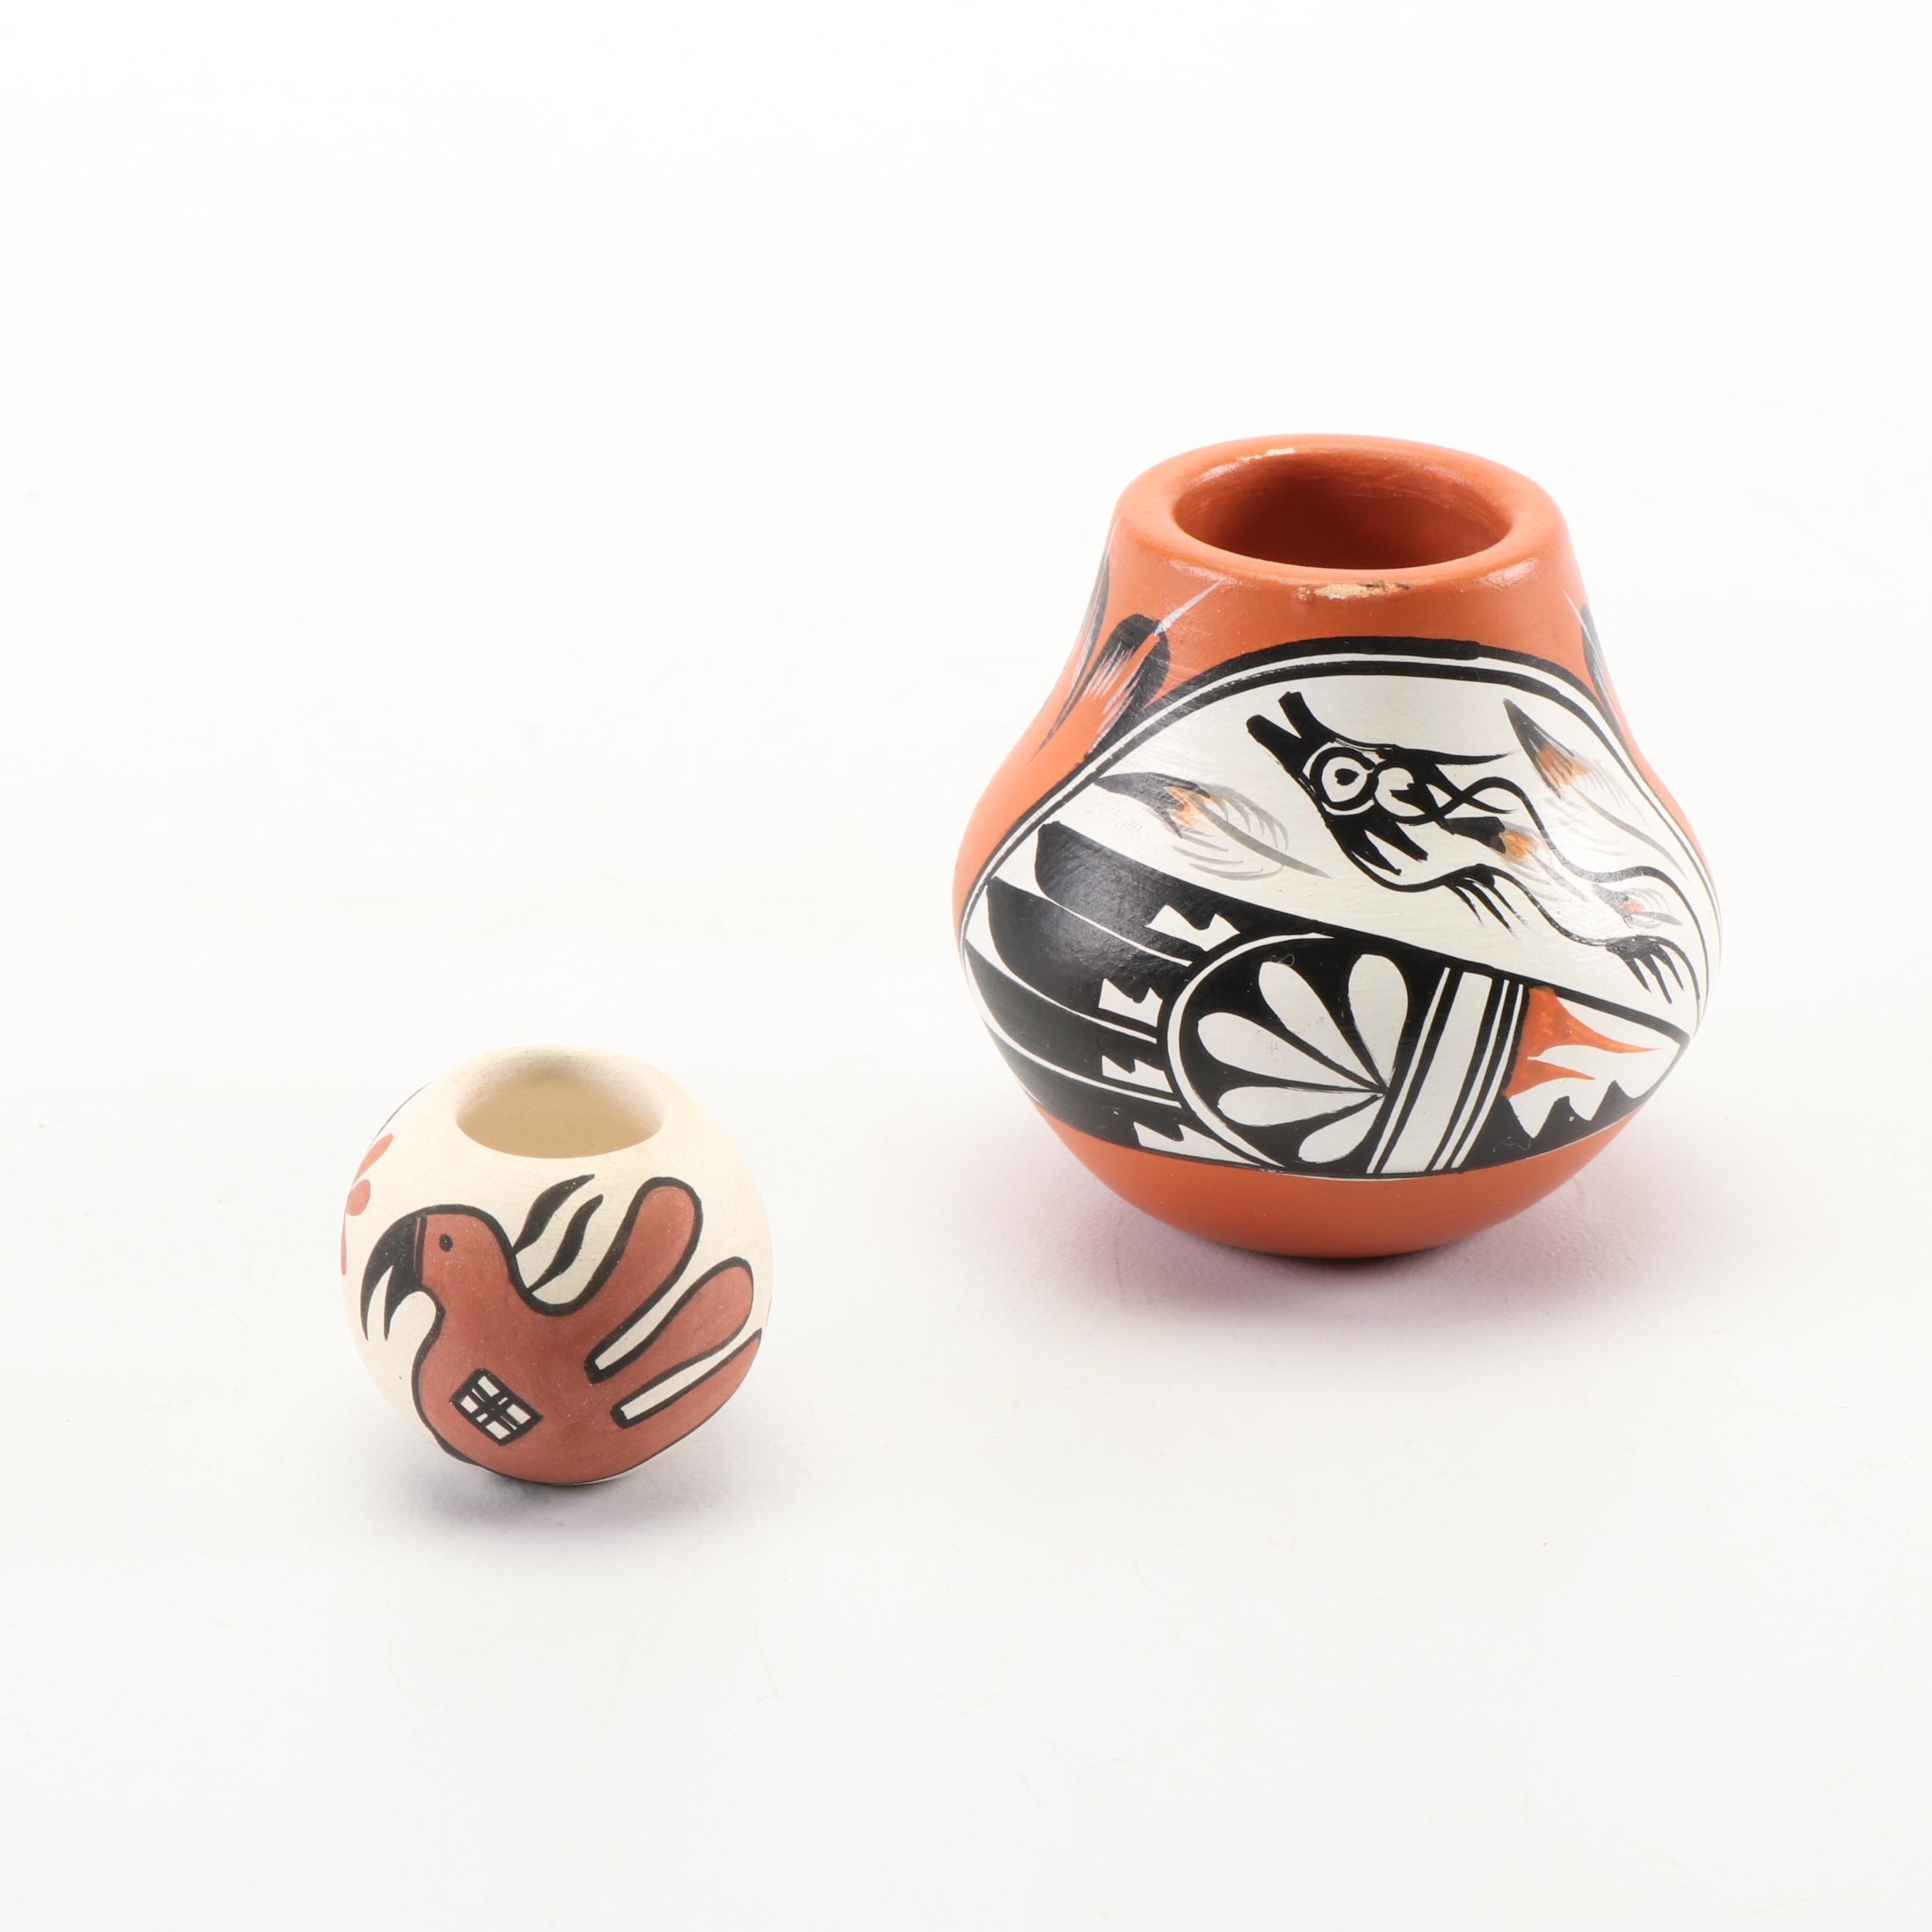 Signed V. Tafoya Jemez and K. Torivio Miniature Pueblo Pottery